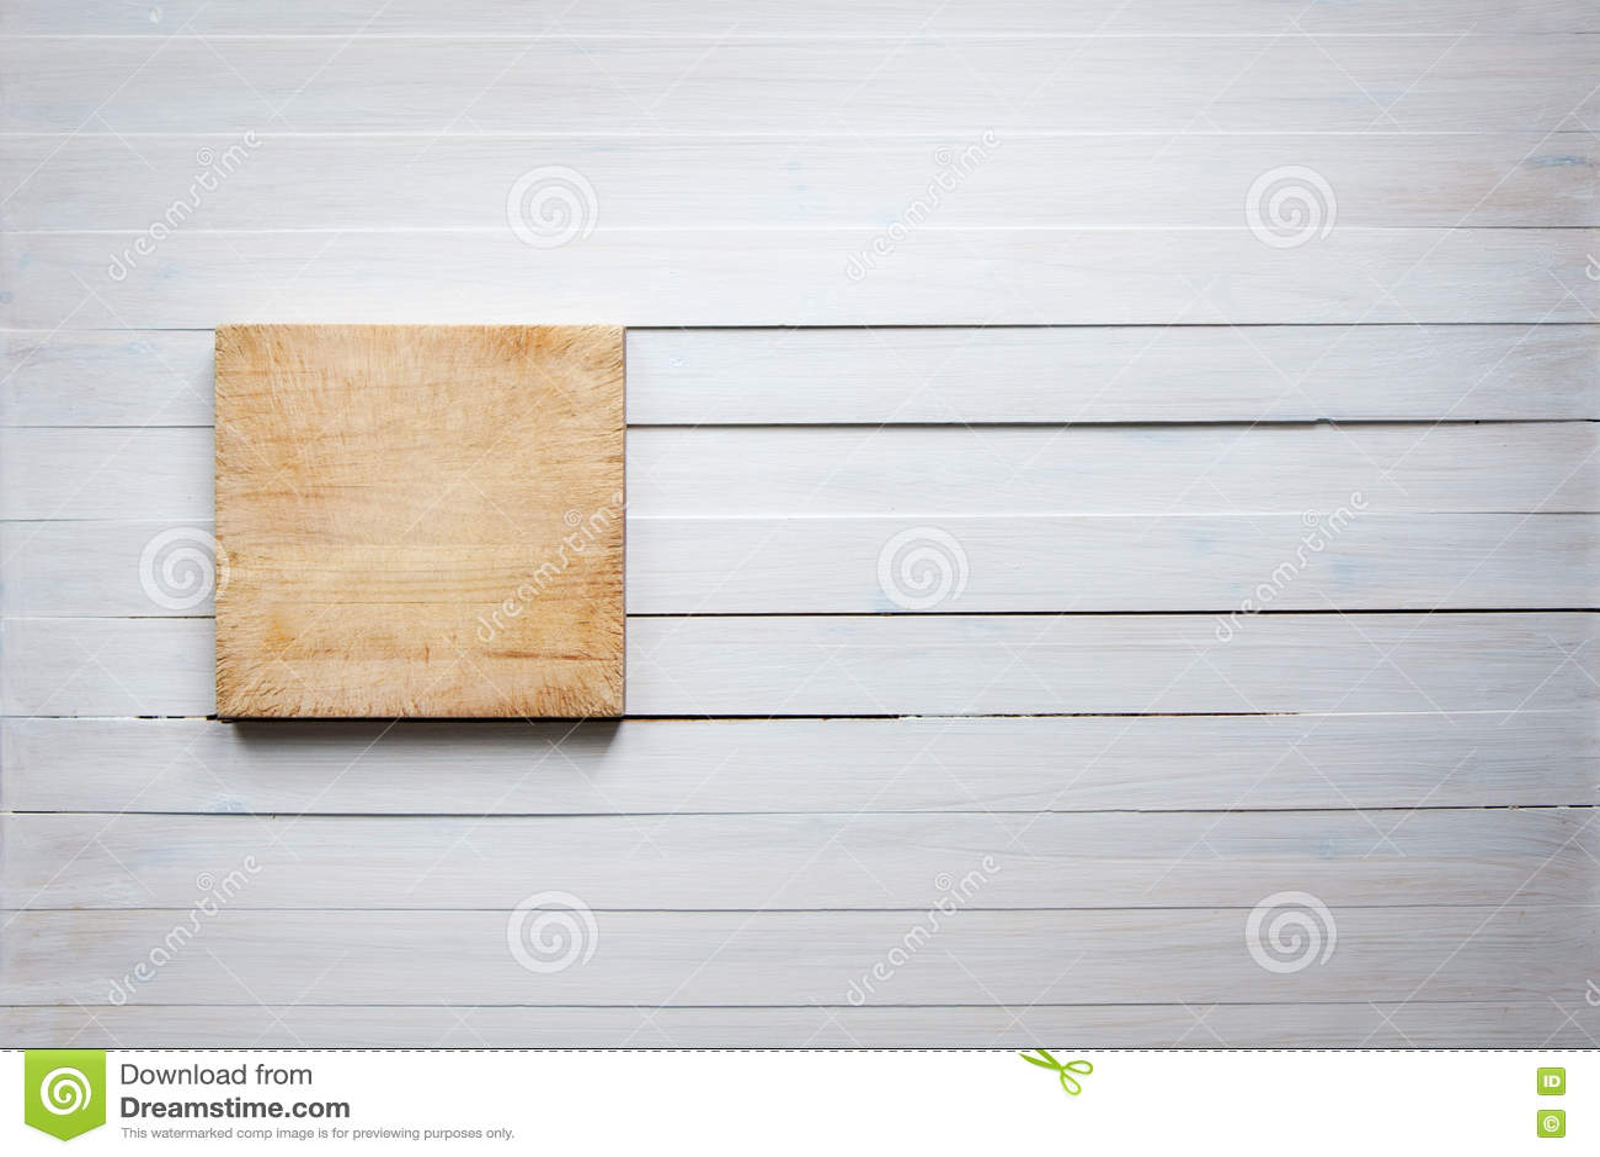 Legno Bianco Texture : Texture legno bianco Изображения стоковые фотографии и векторная